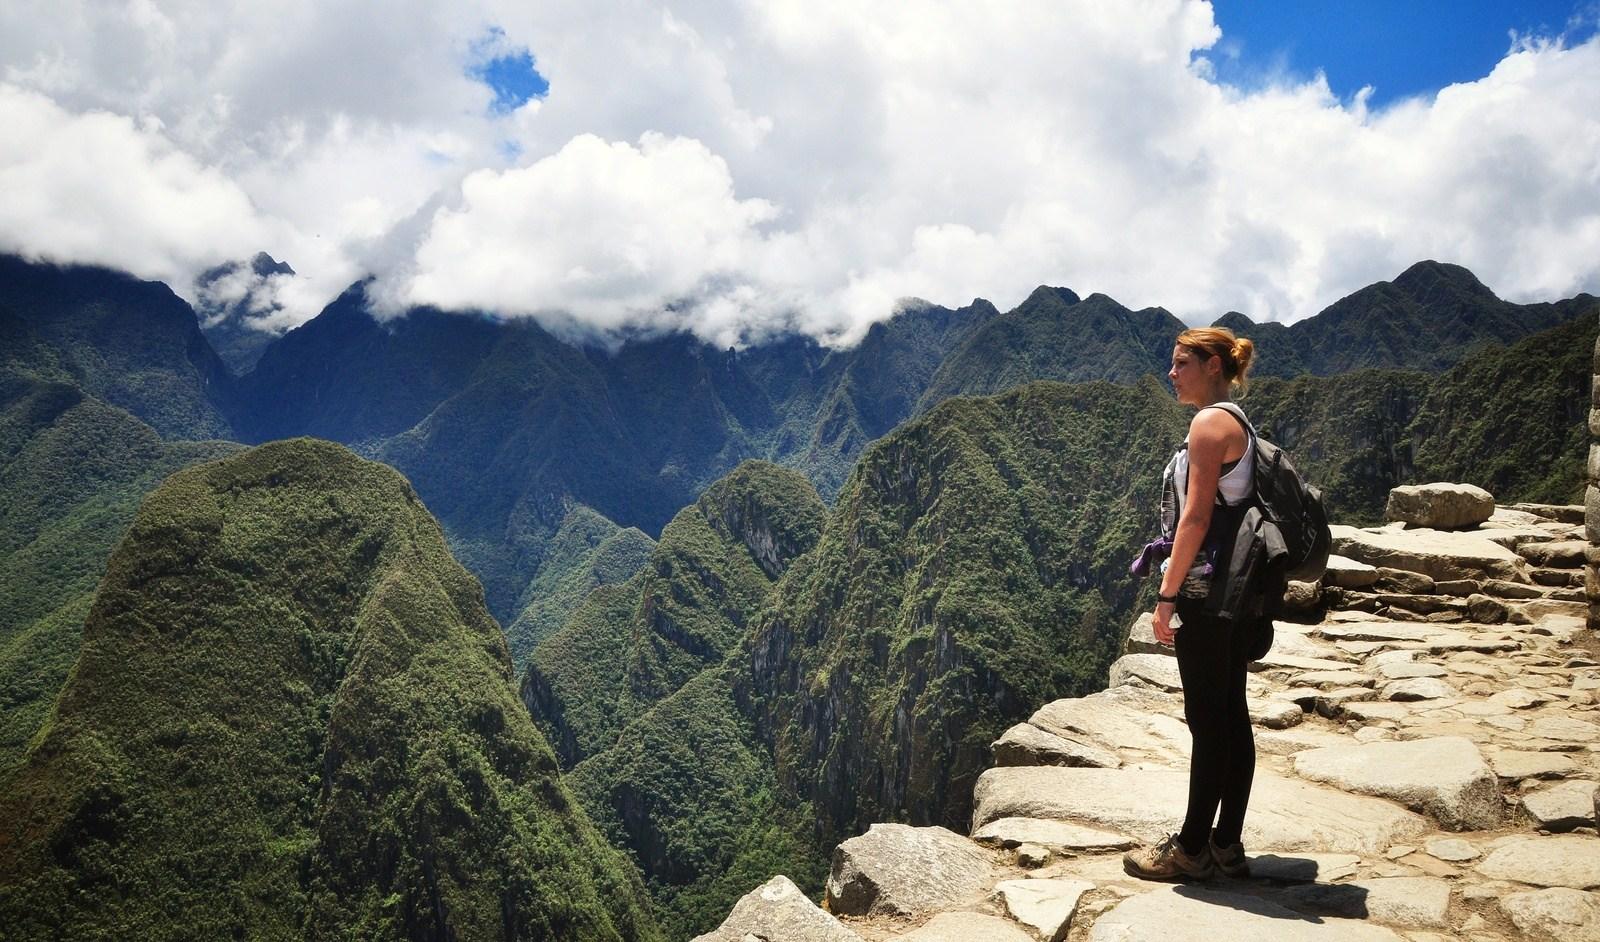 Ciel et montagnes, Machu Picchu Machu Picchu